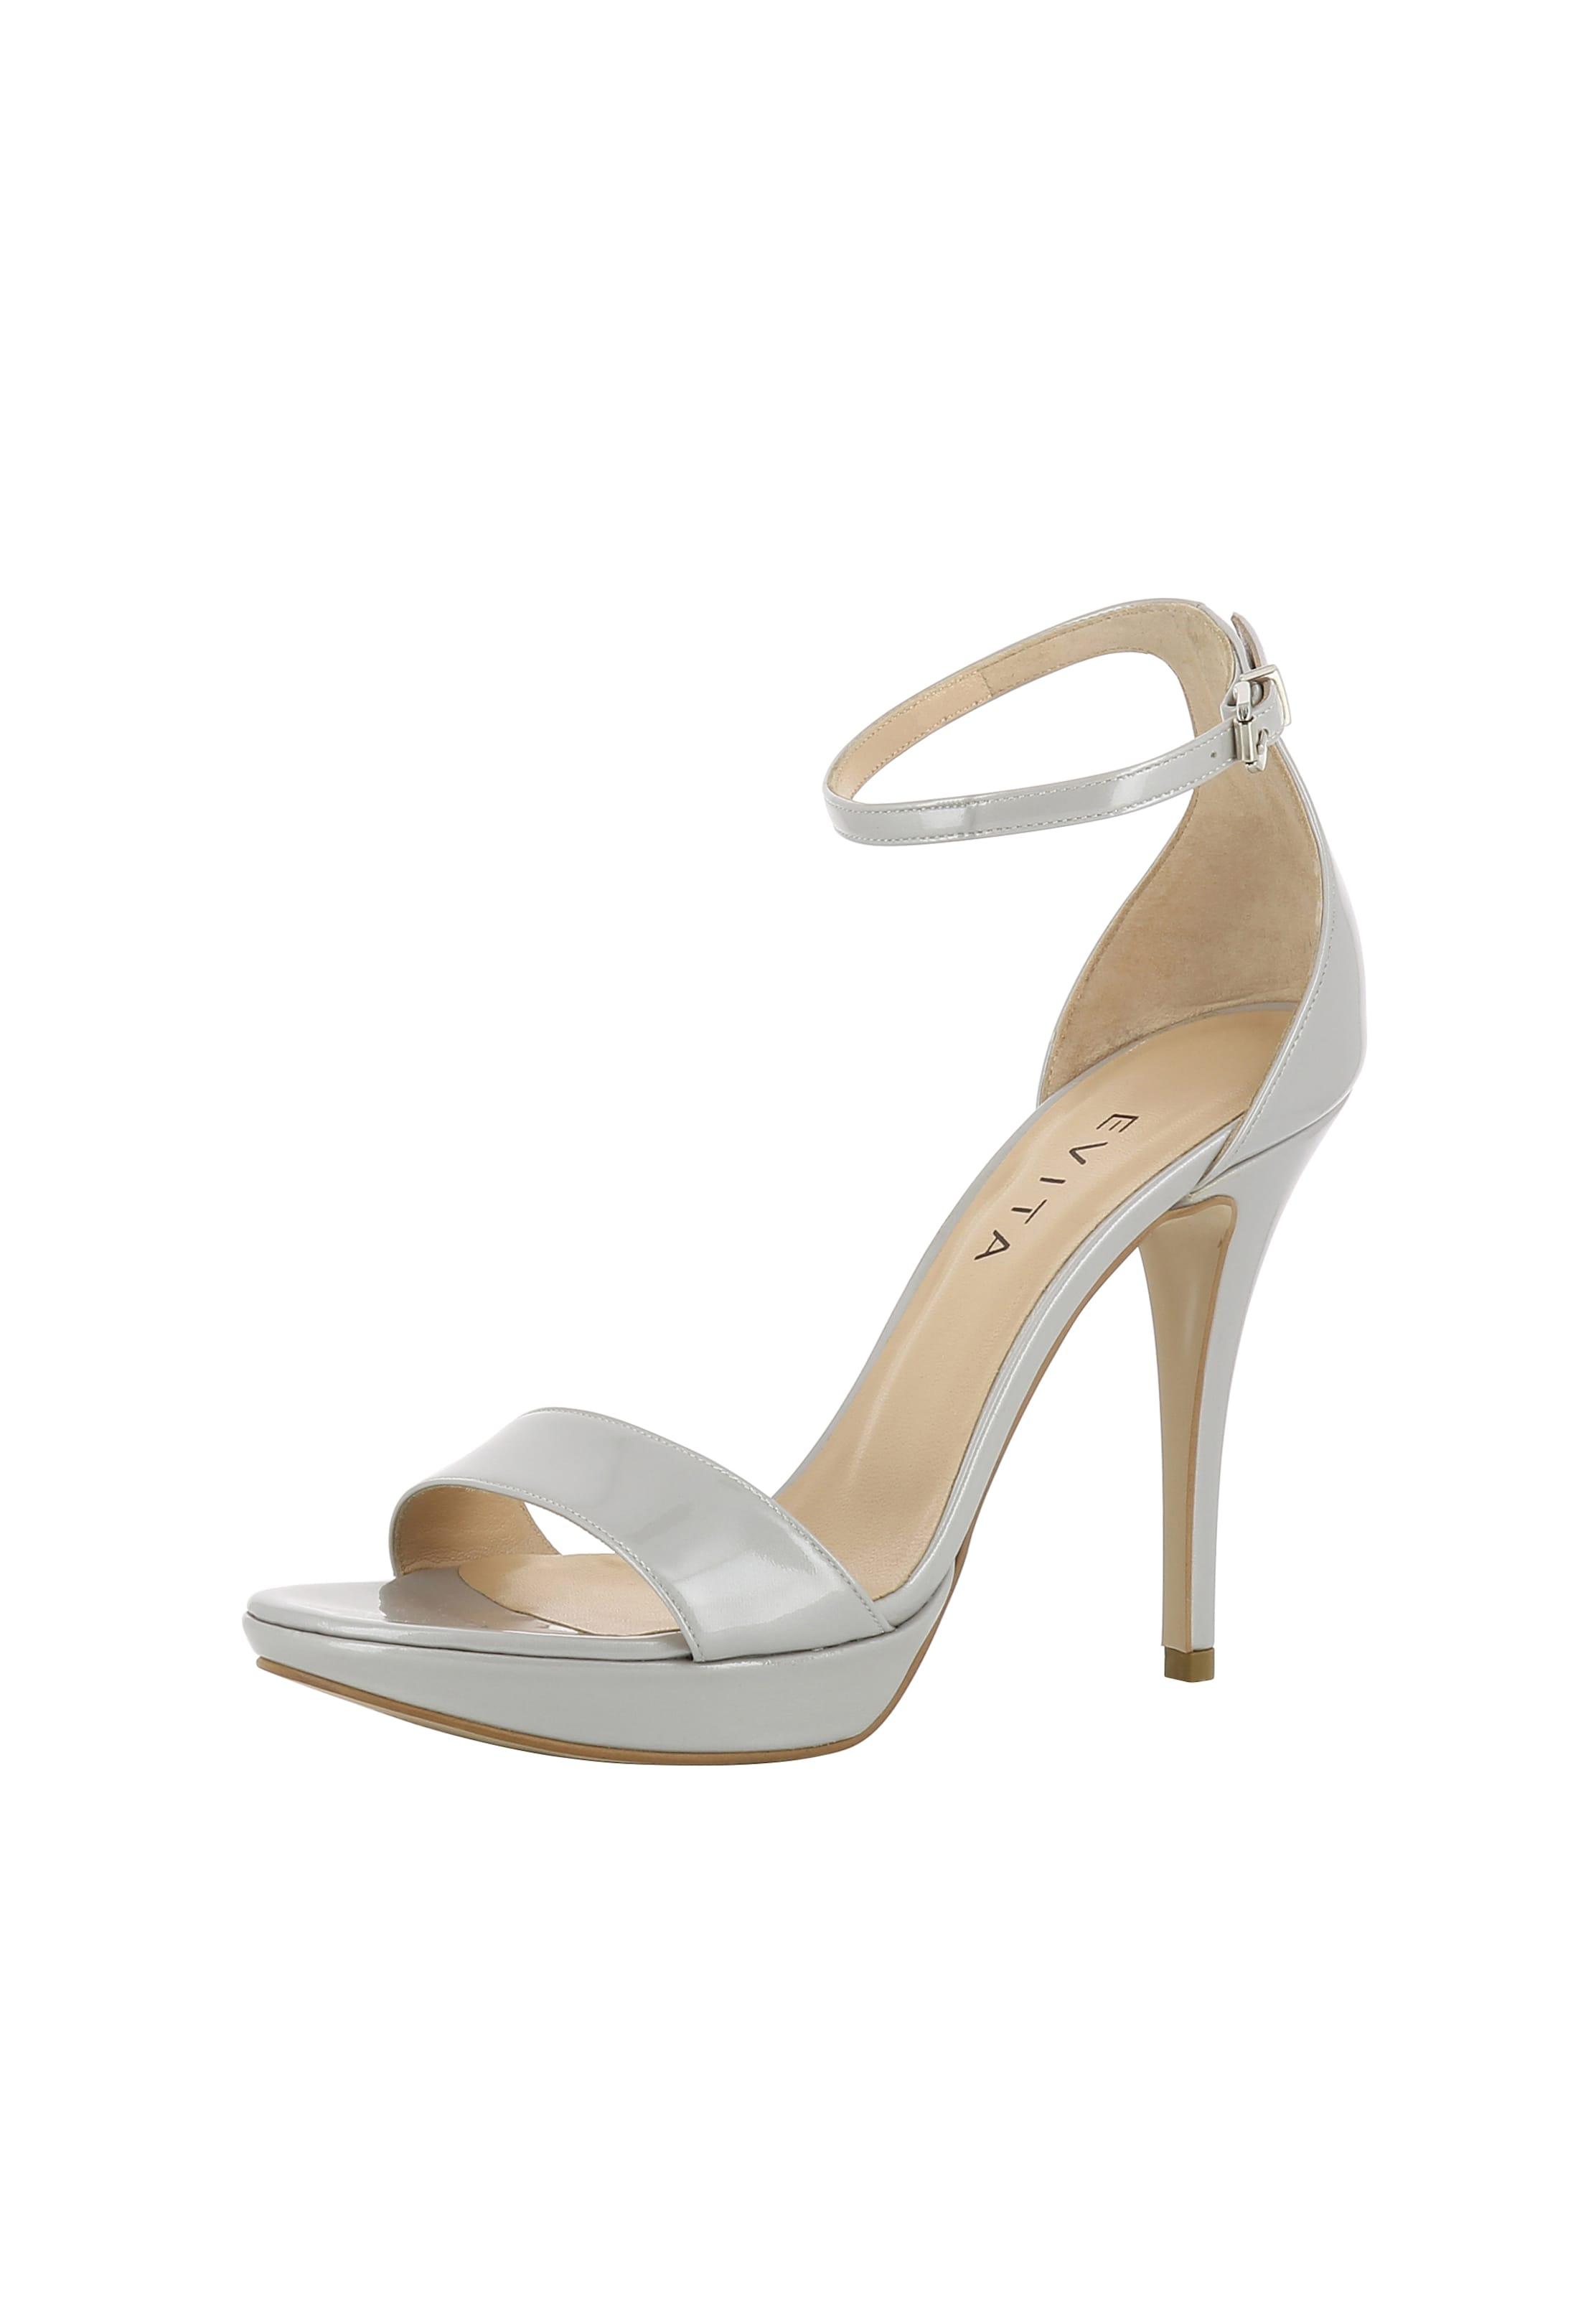 Haltbare Mode billige Schuhe EVITA | Sandalette 'VALERIA' Schuhe Gut getragene Schuhe